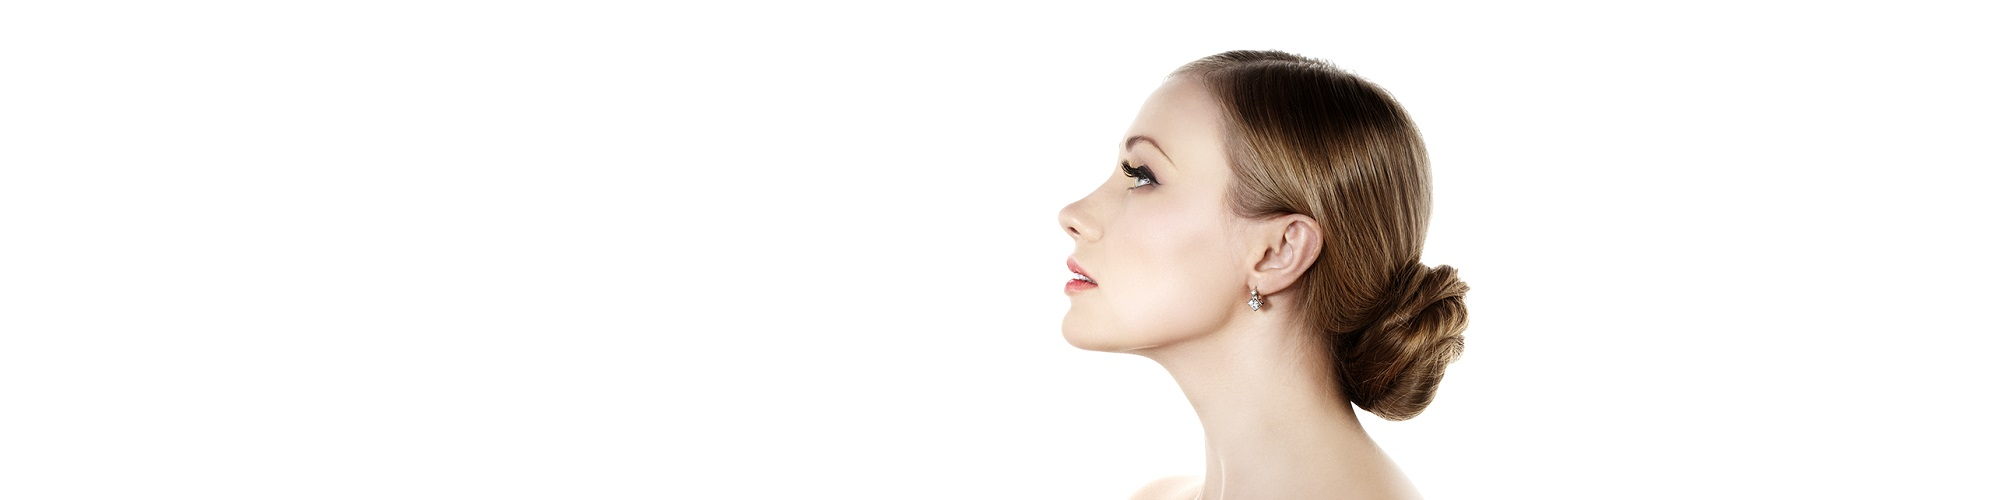 mentoplastica-catania-chirurgia-plastica-youplast